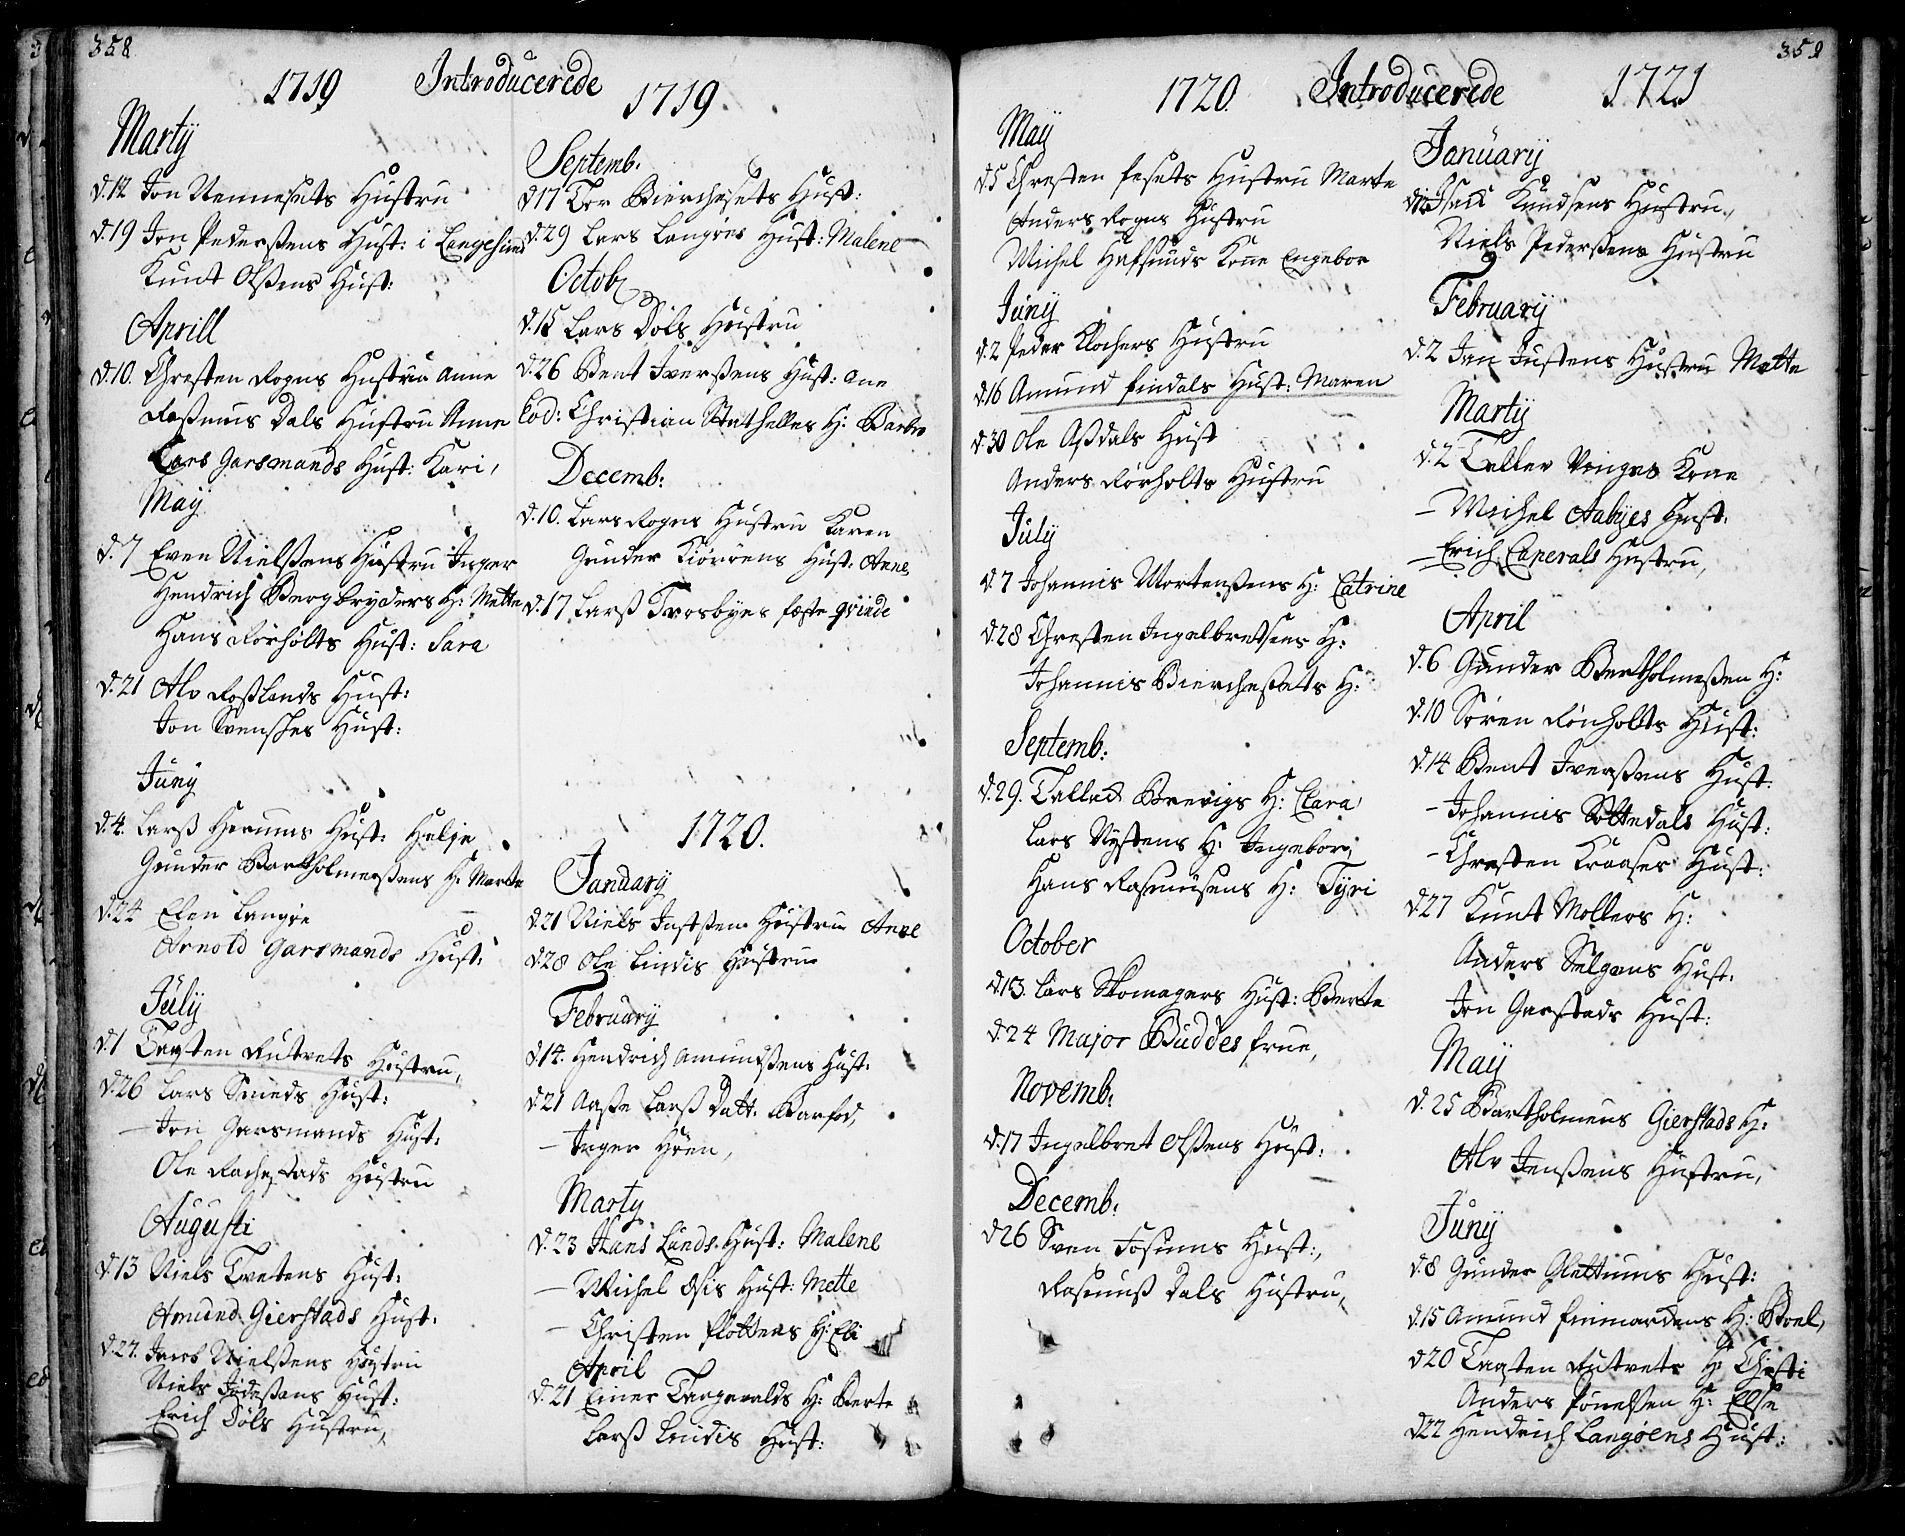 SAKO, Bamble kirkebøker, F/Fa/L0001: Ministerialbok nr. I 1, 1702-1774, s. 358-359